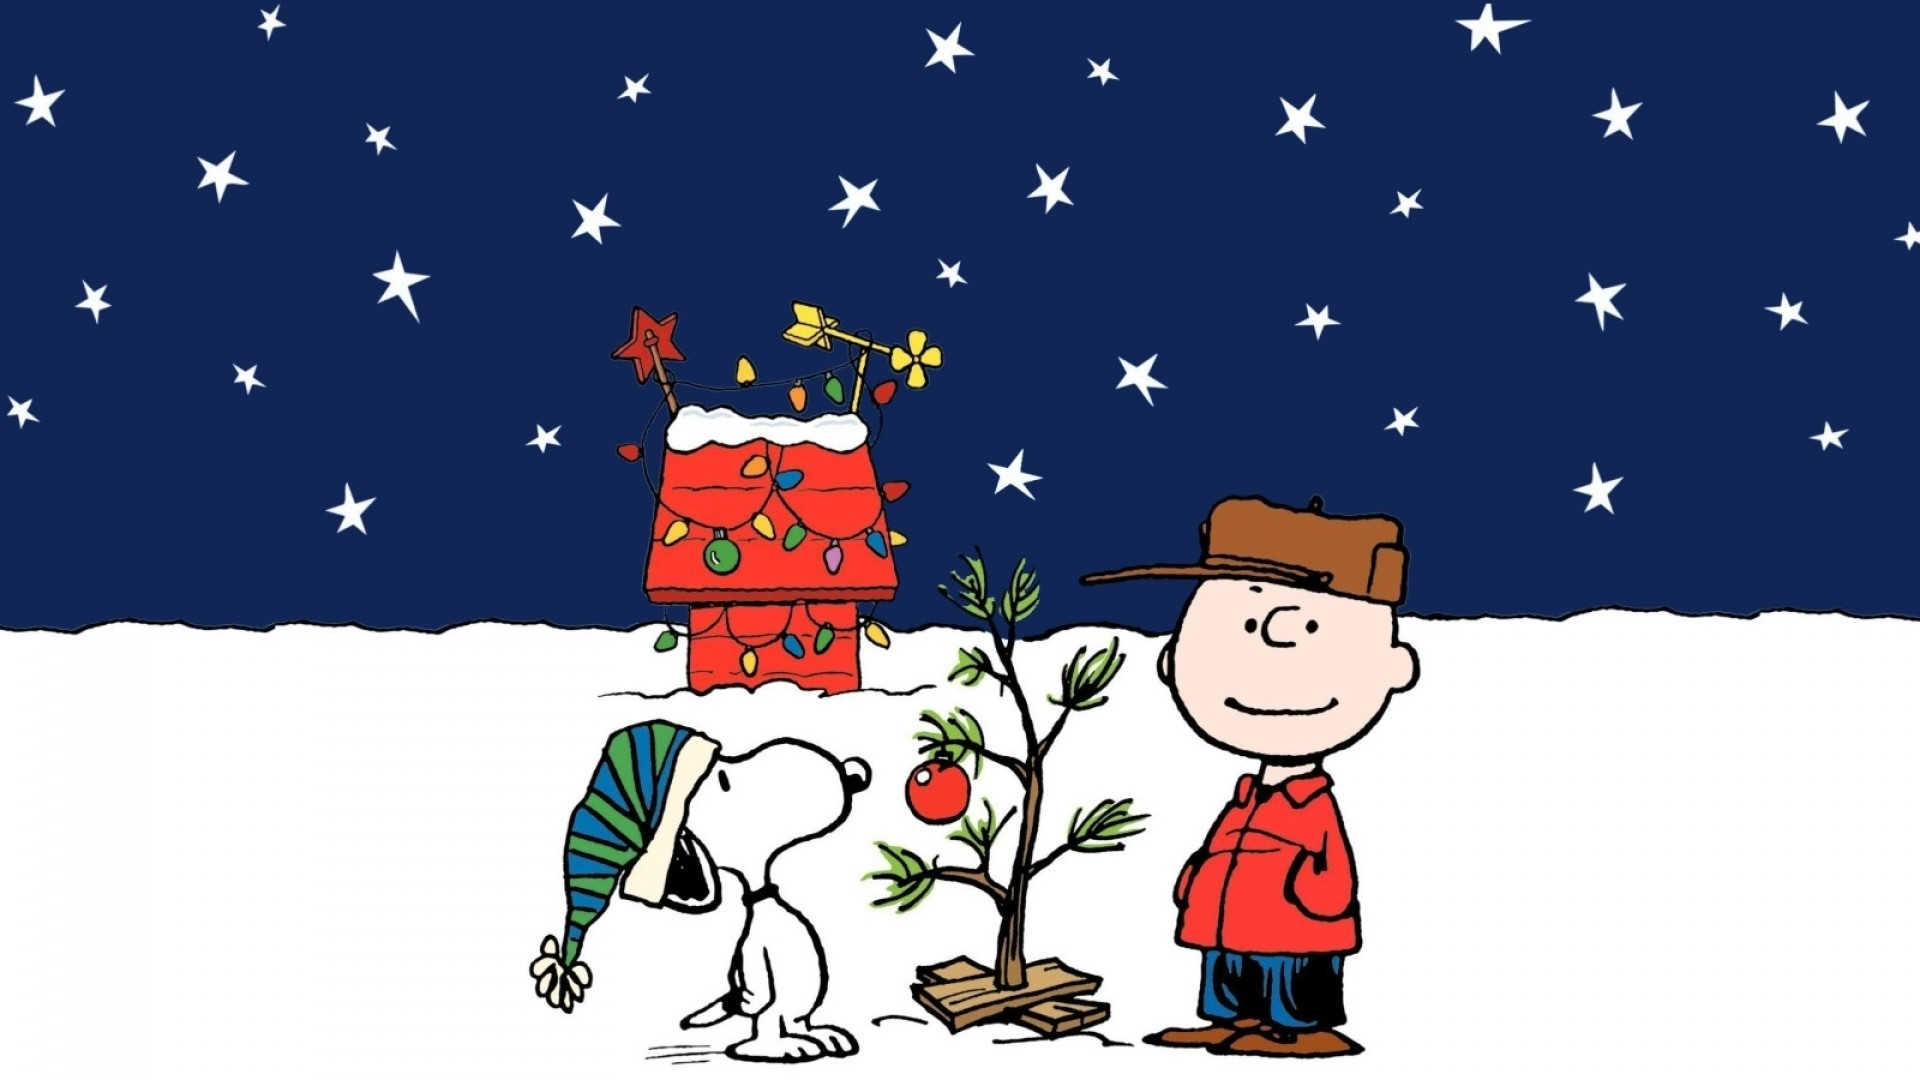 snoopy christmas gg wallpaper | | 160960 | WallpaperUP .